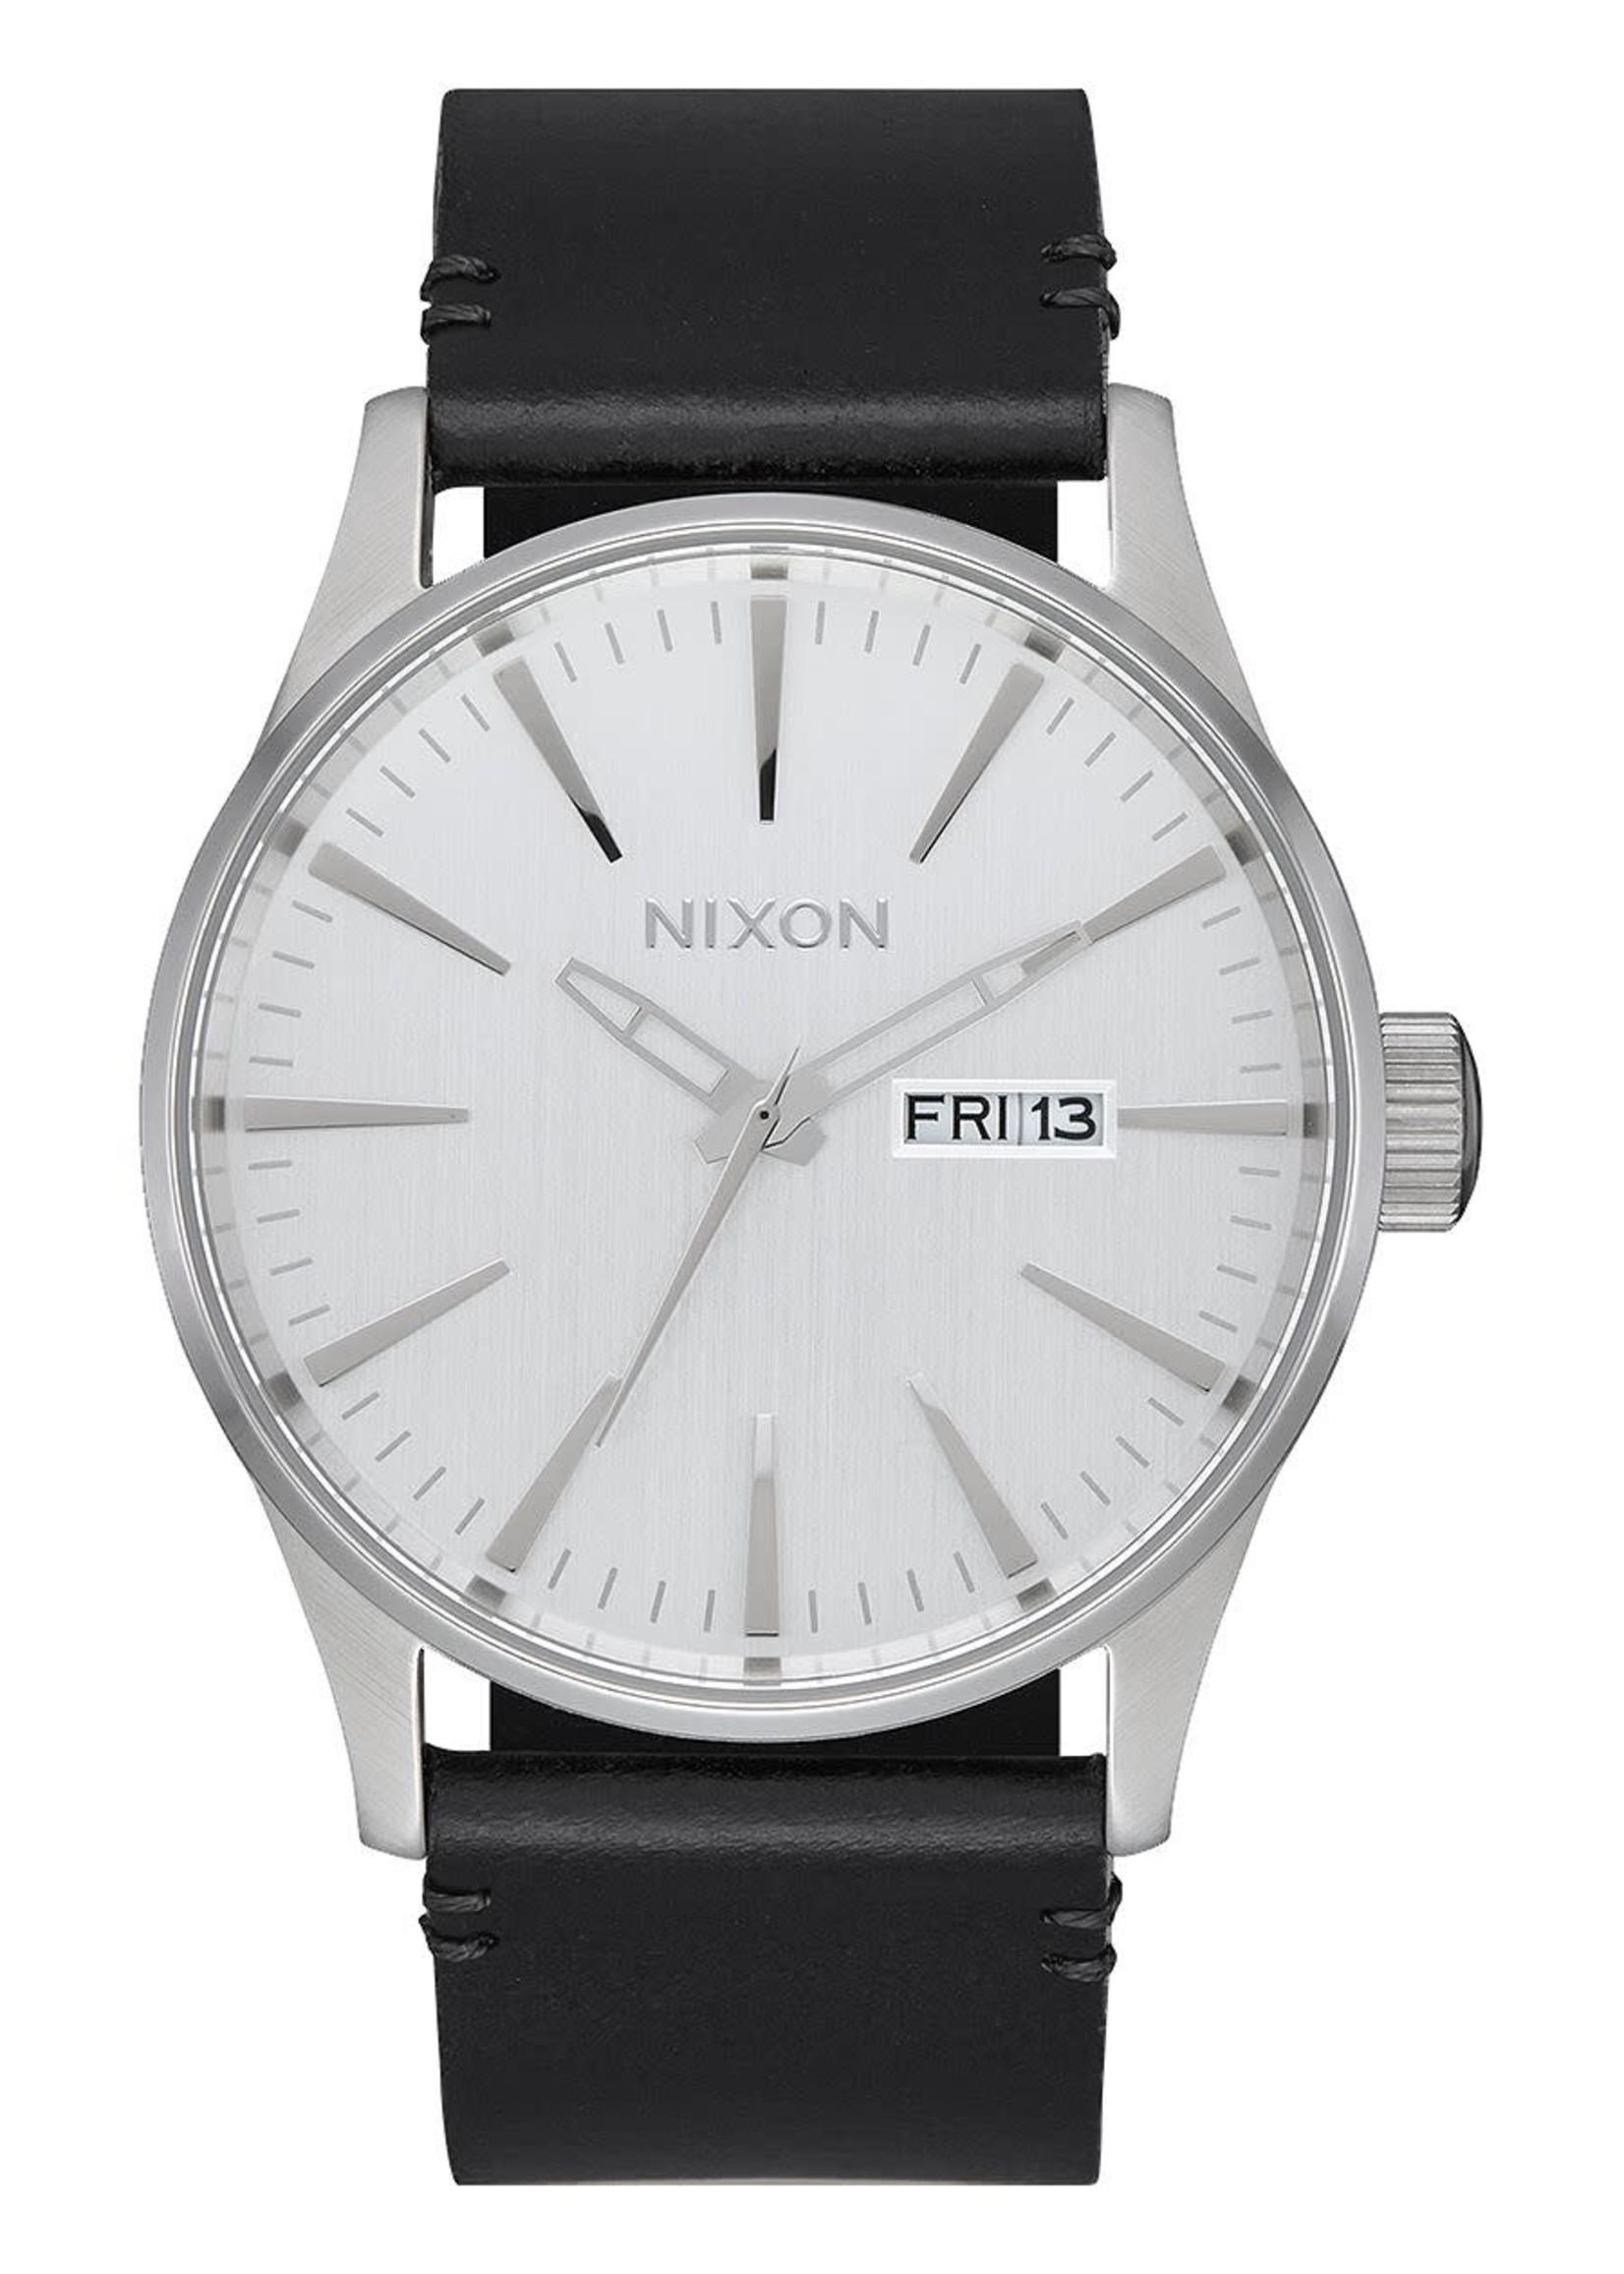 NIXON Sentry Leather Watch, Silver/ Black